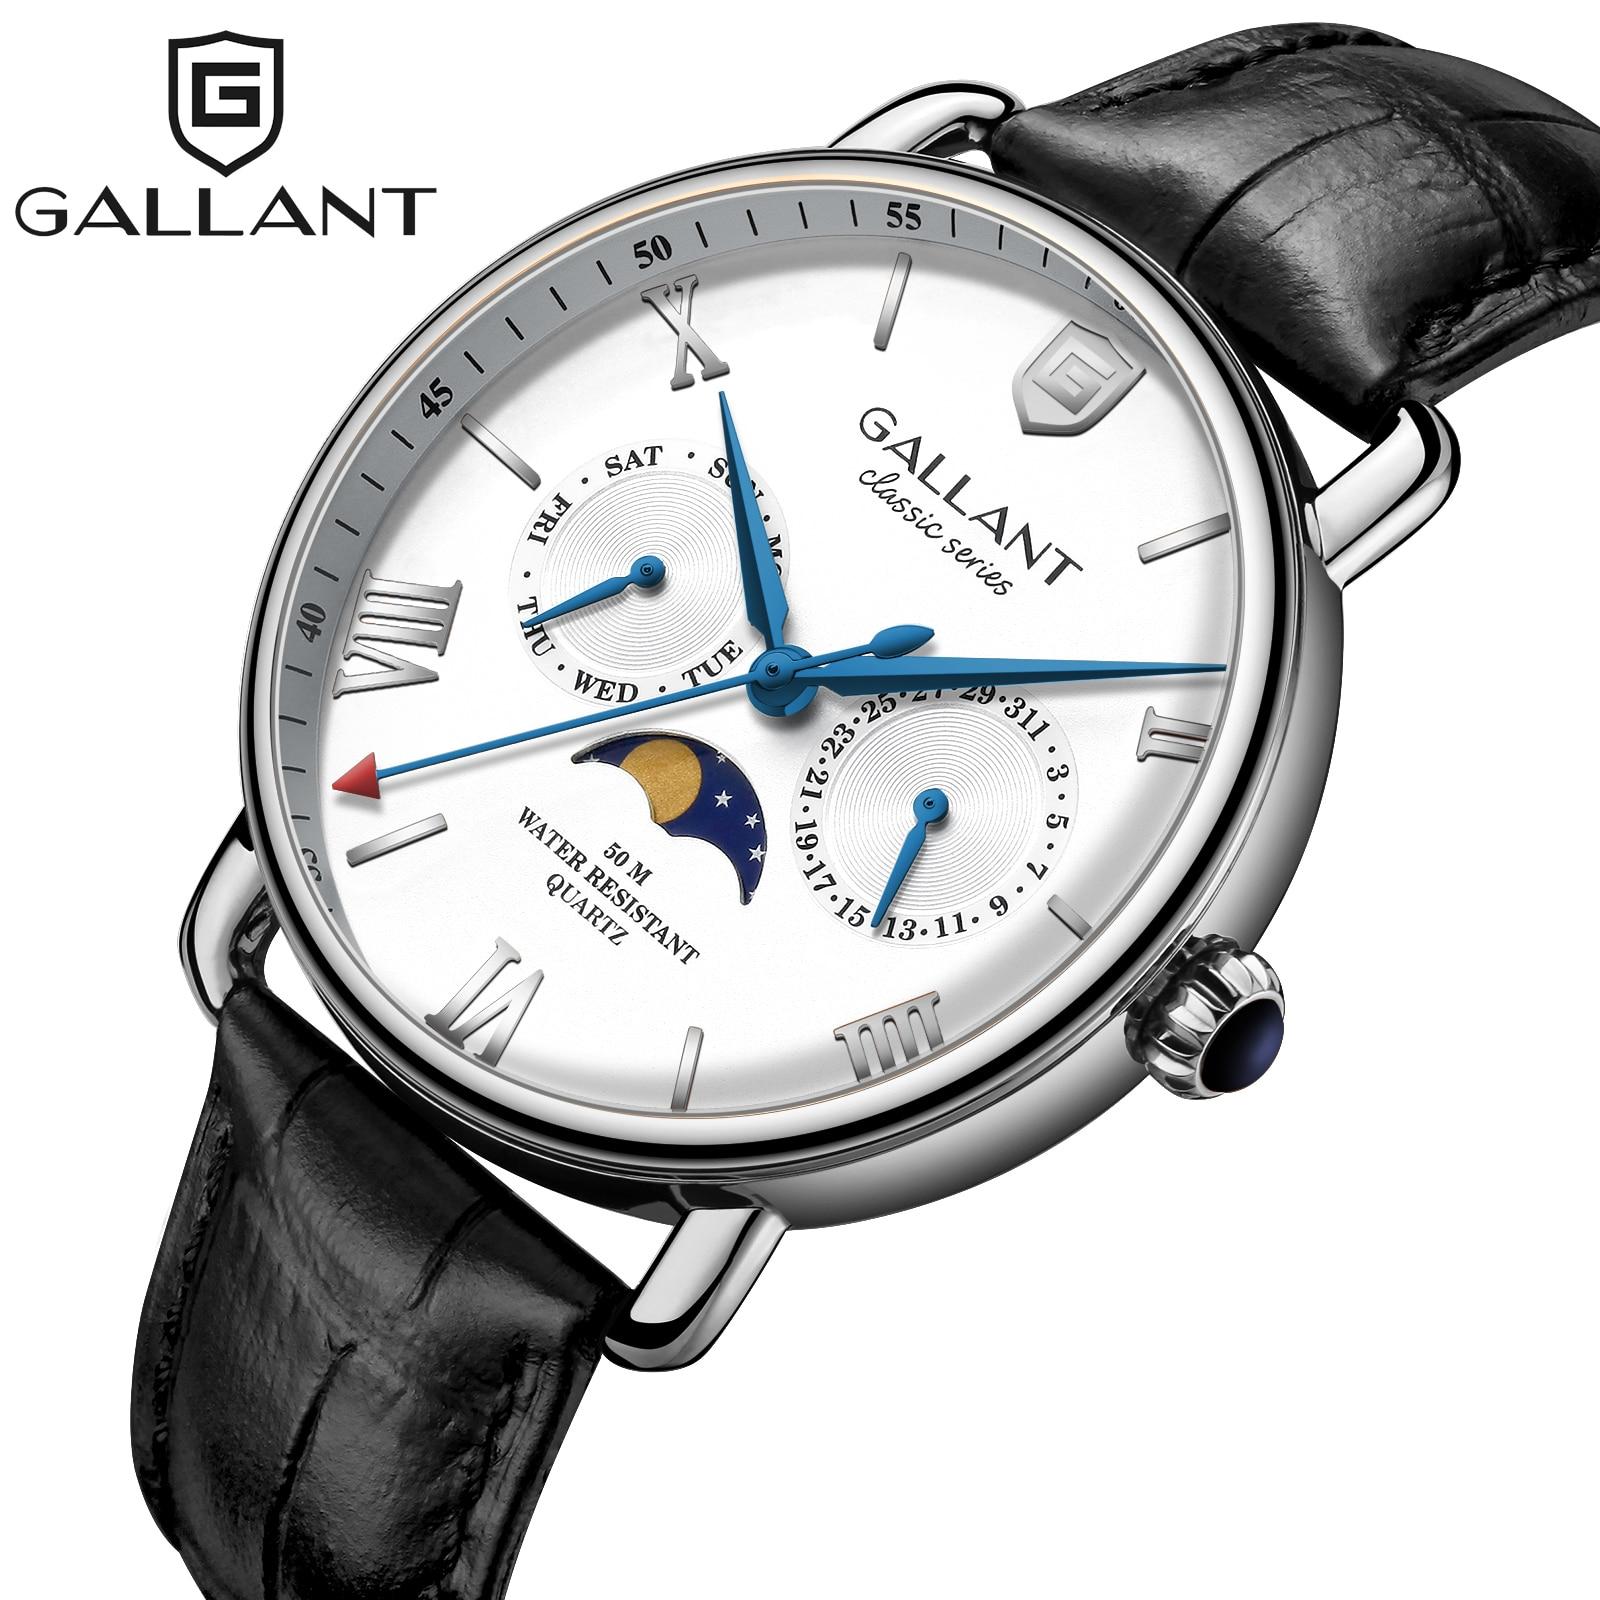 Silver Quartz Watch Moon Phase Watch Waterproof Watch Watches For Men